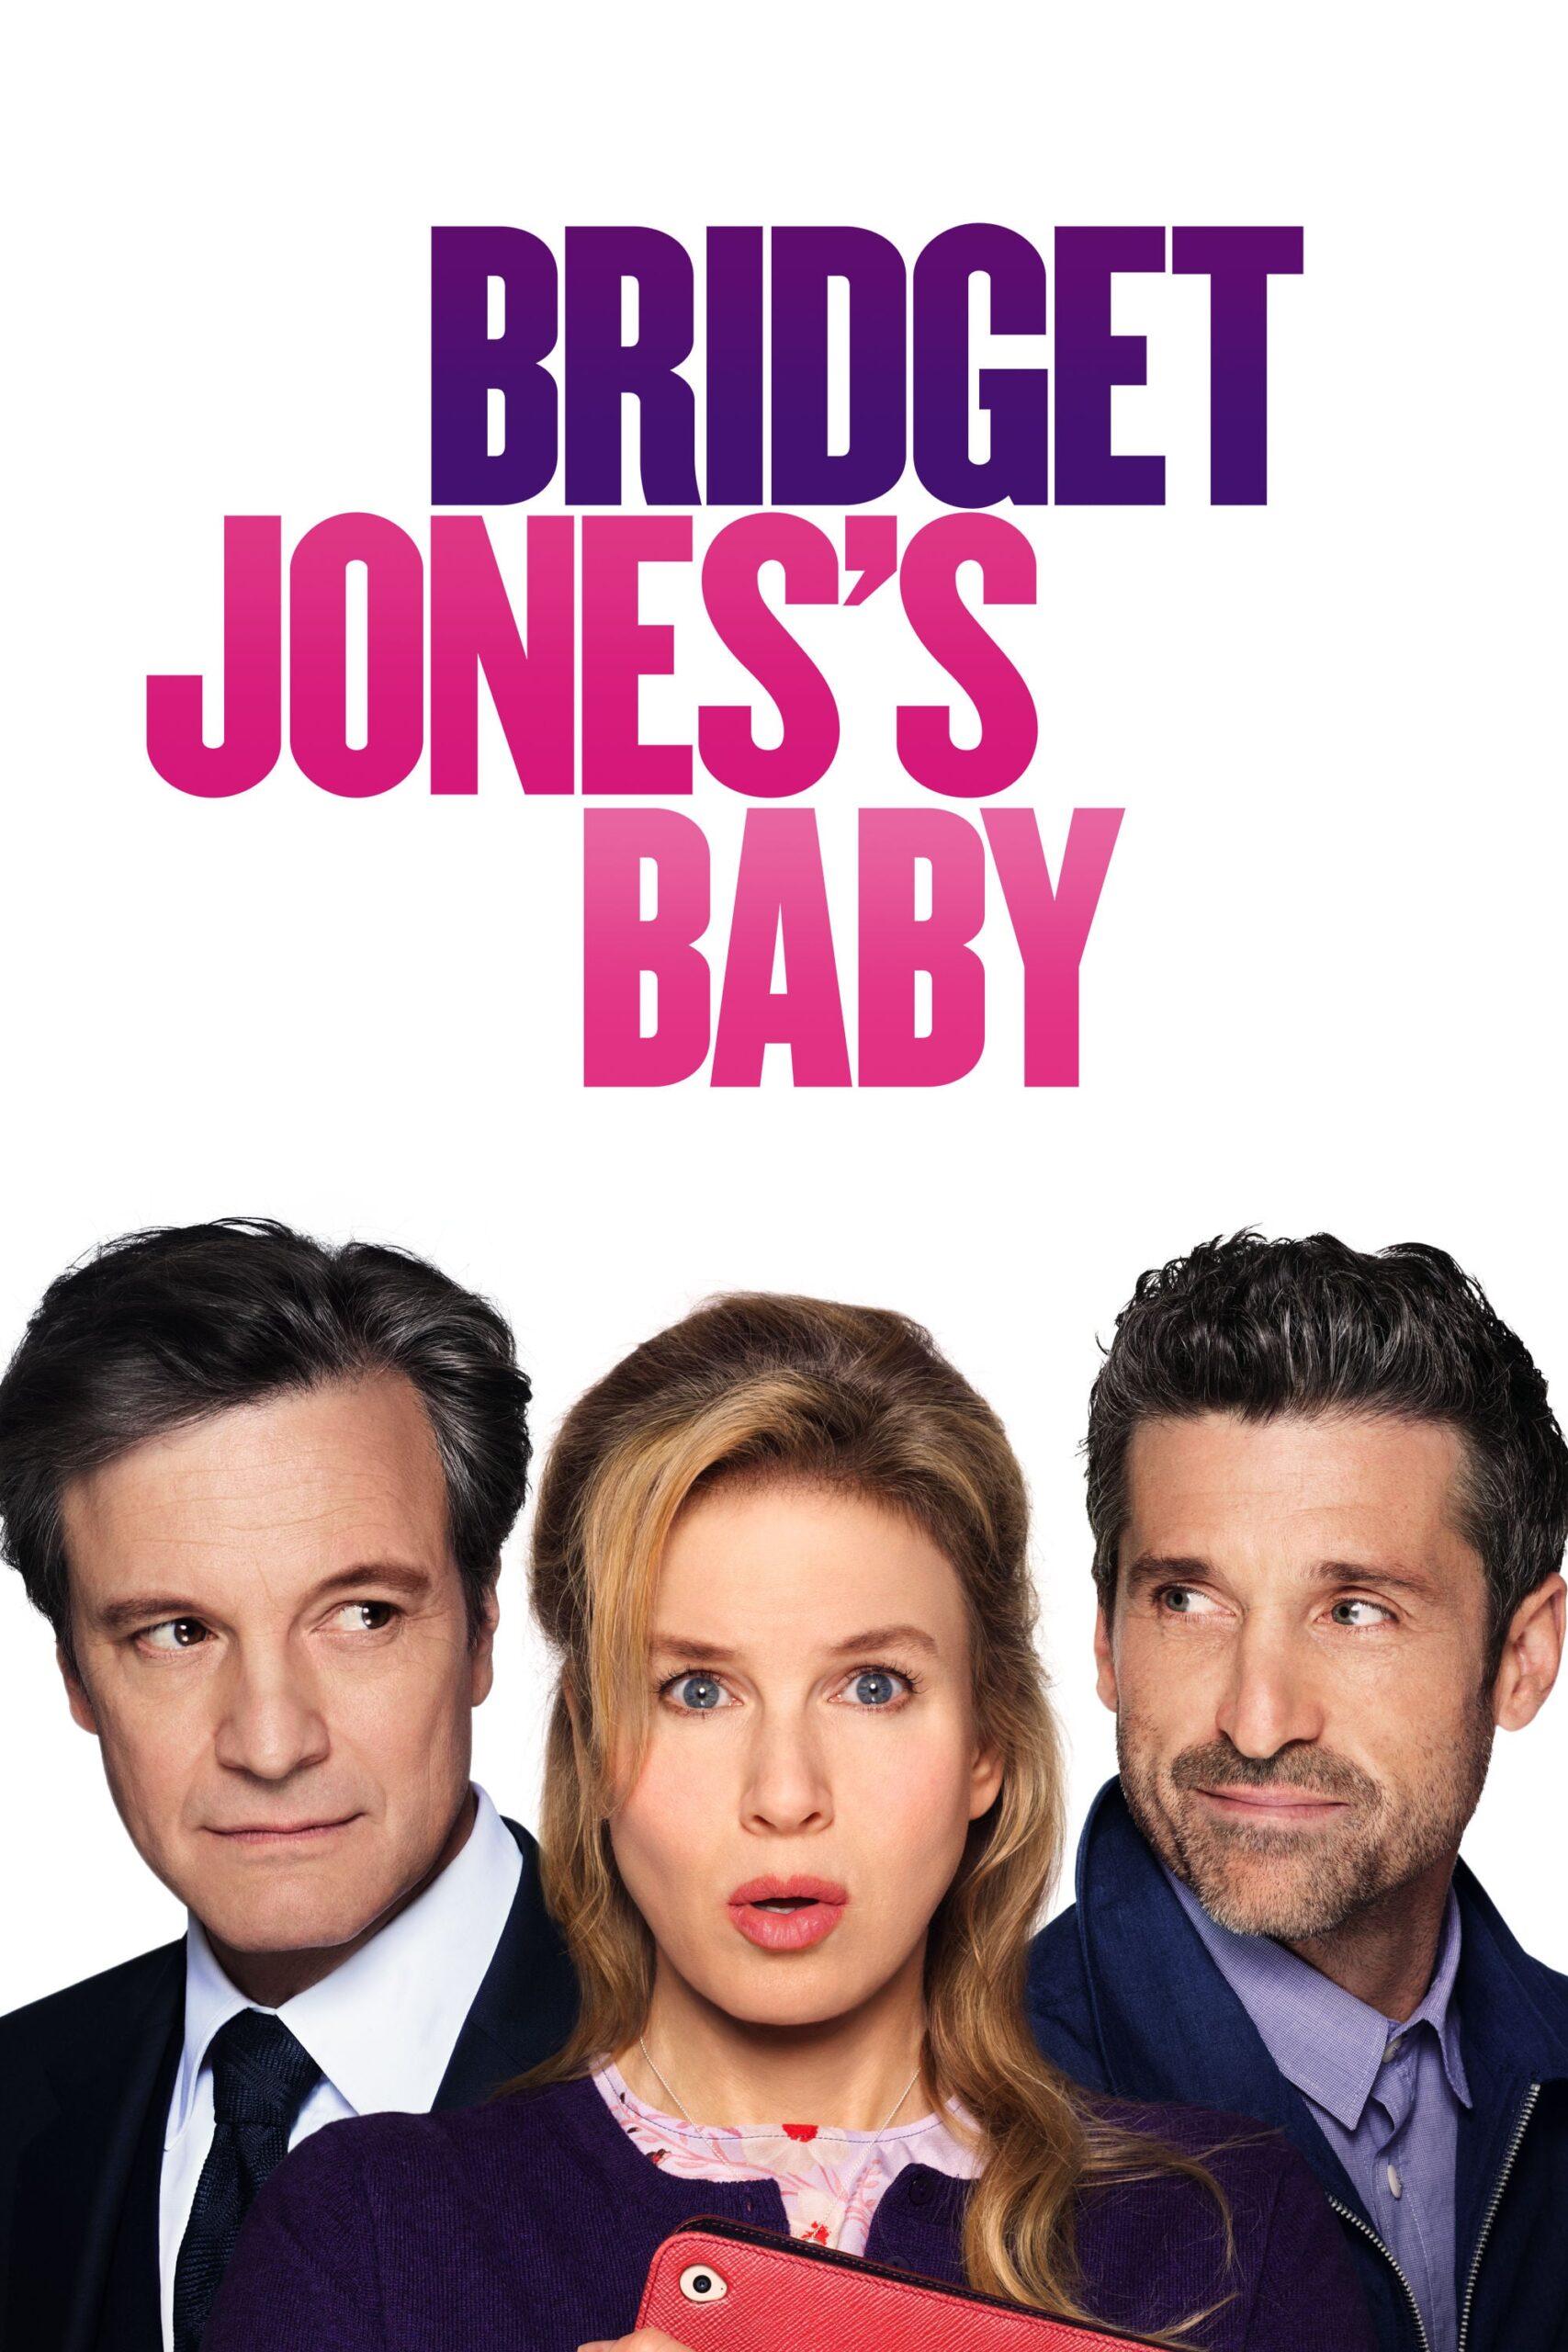 Bridget Jones 1 Streaming : bridget, jones, streaming, Bridget, Jones's, Movie, Streaming, Online, Watch